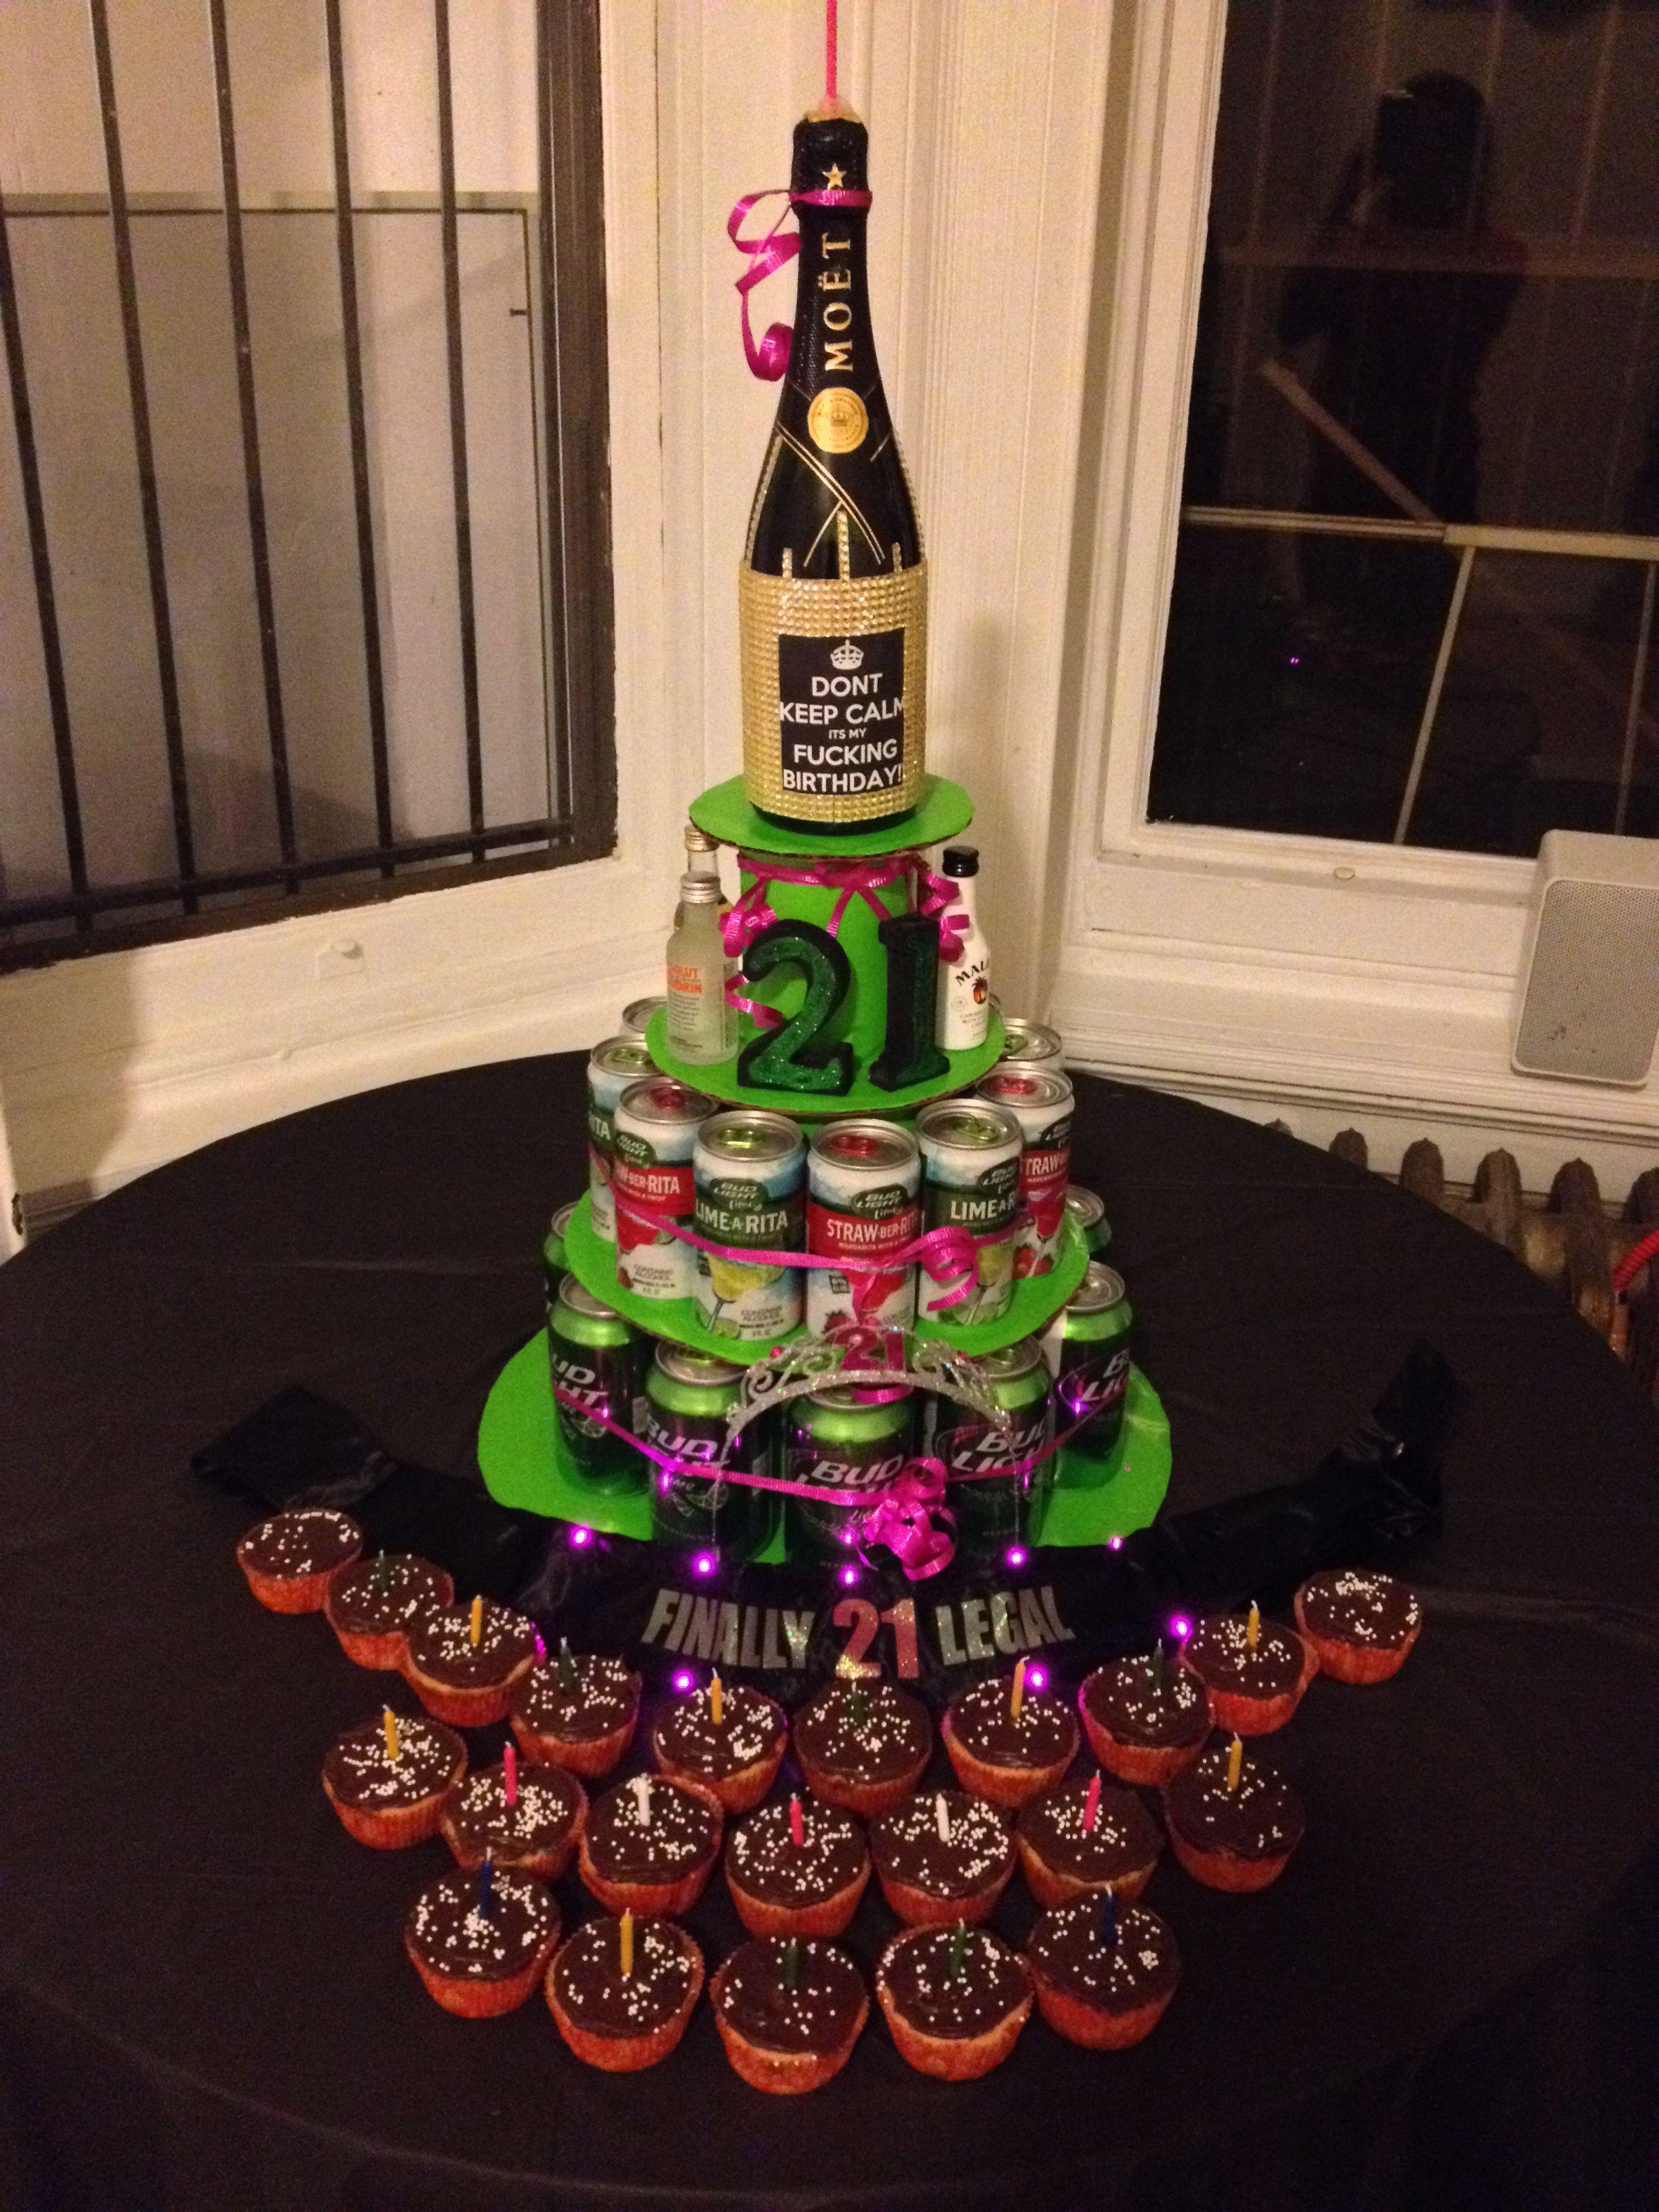 Roomates 21st bday alcohol cake | 21st bday ideas, Diy ...